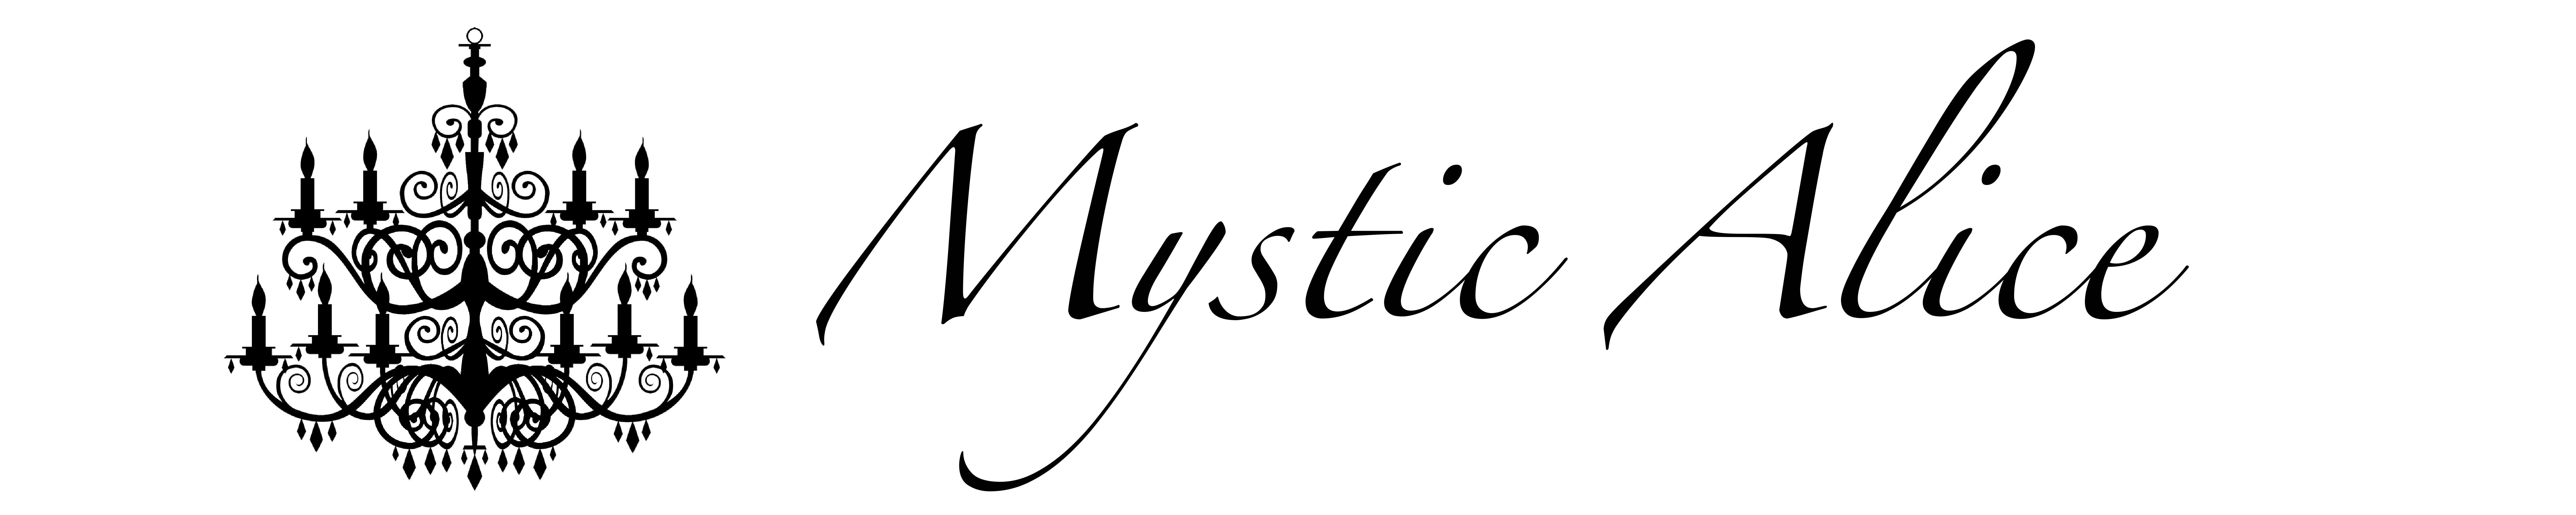 mysticalice